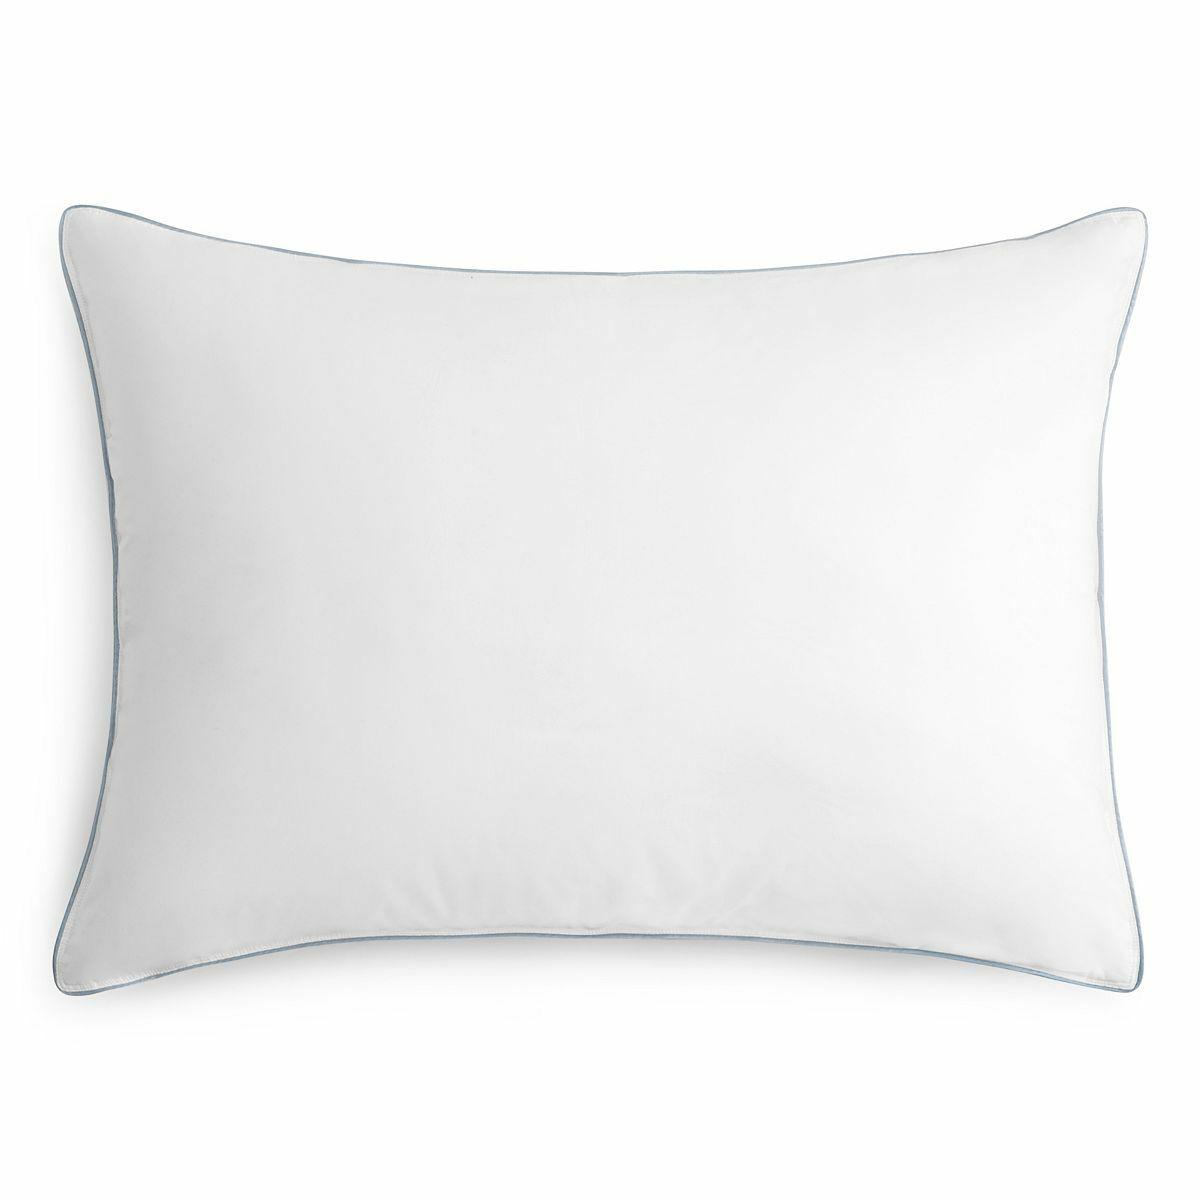 Bloomingdale's King Pillow My Cool Pillow Dacron Memorelle T94181